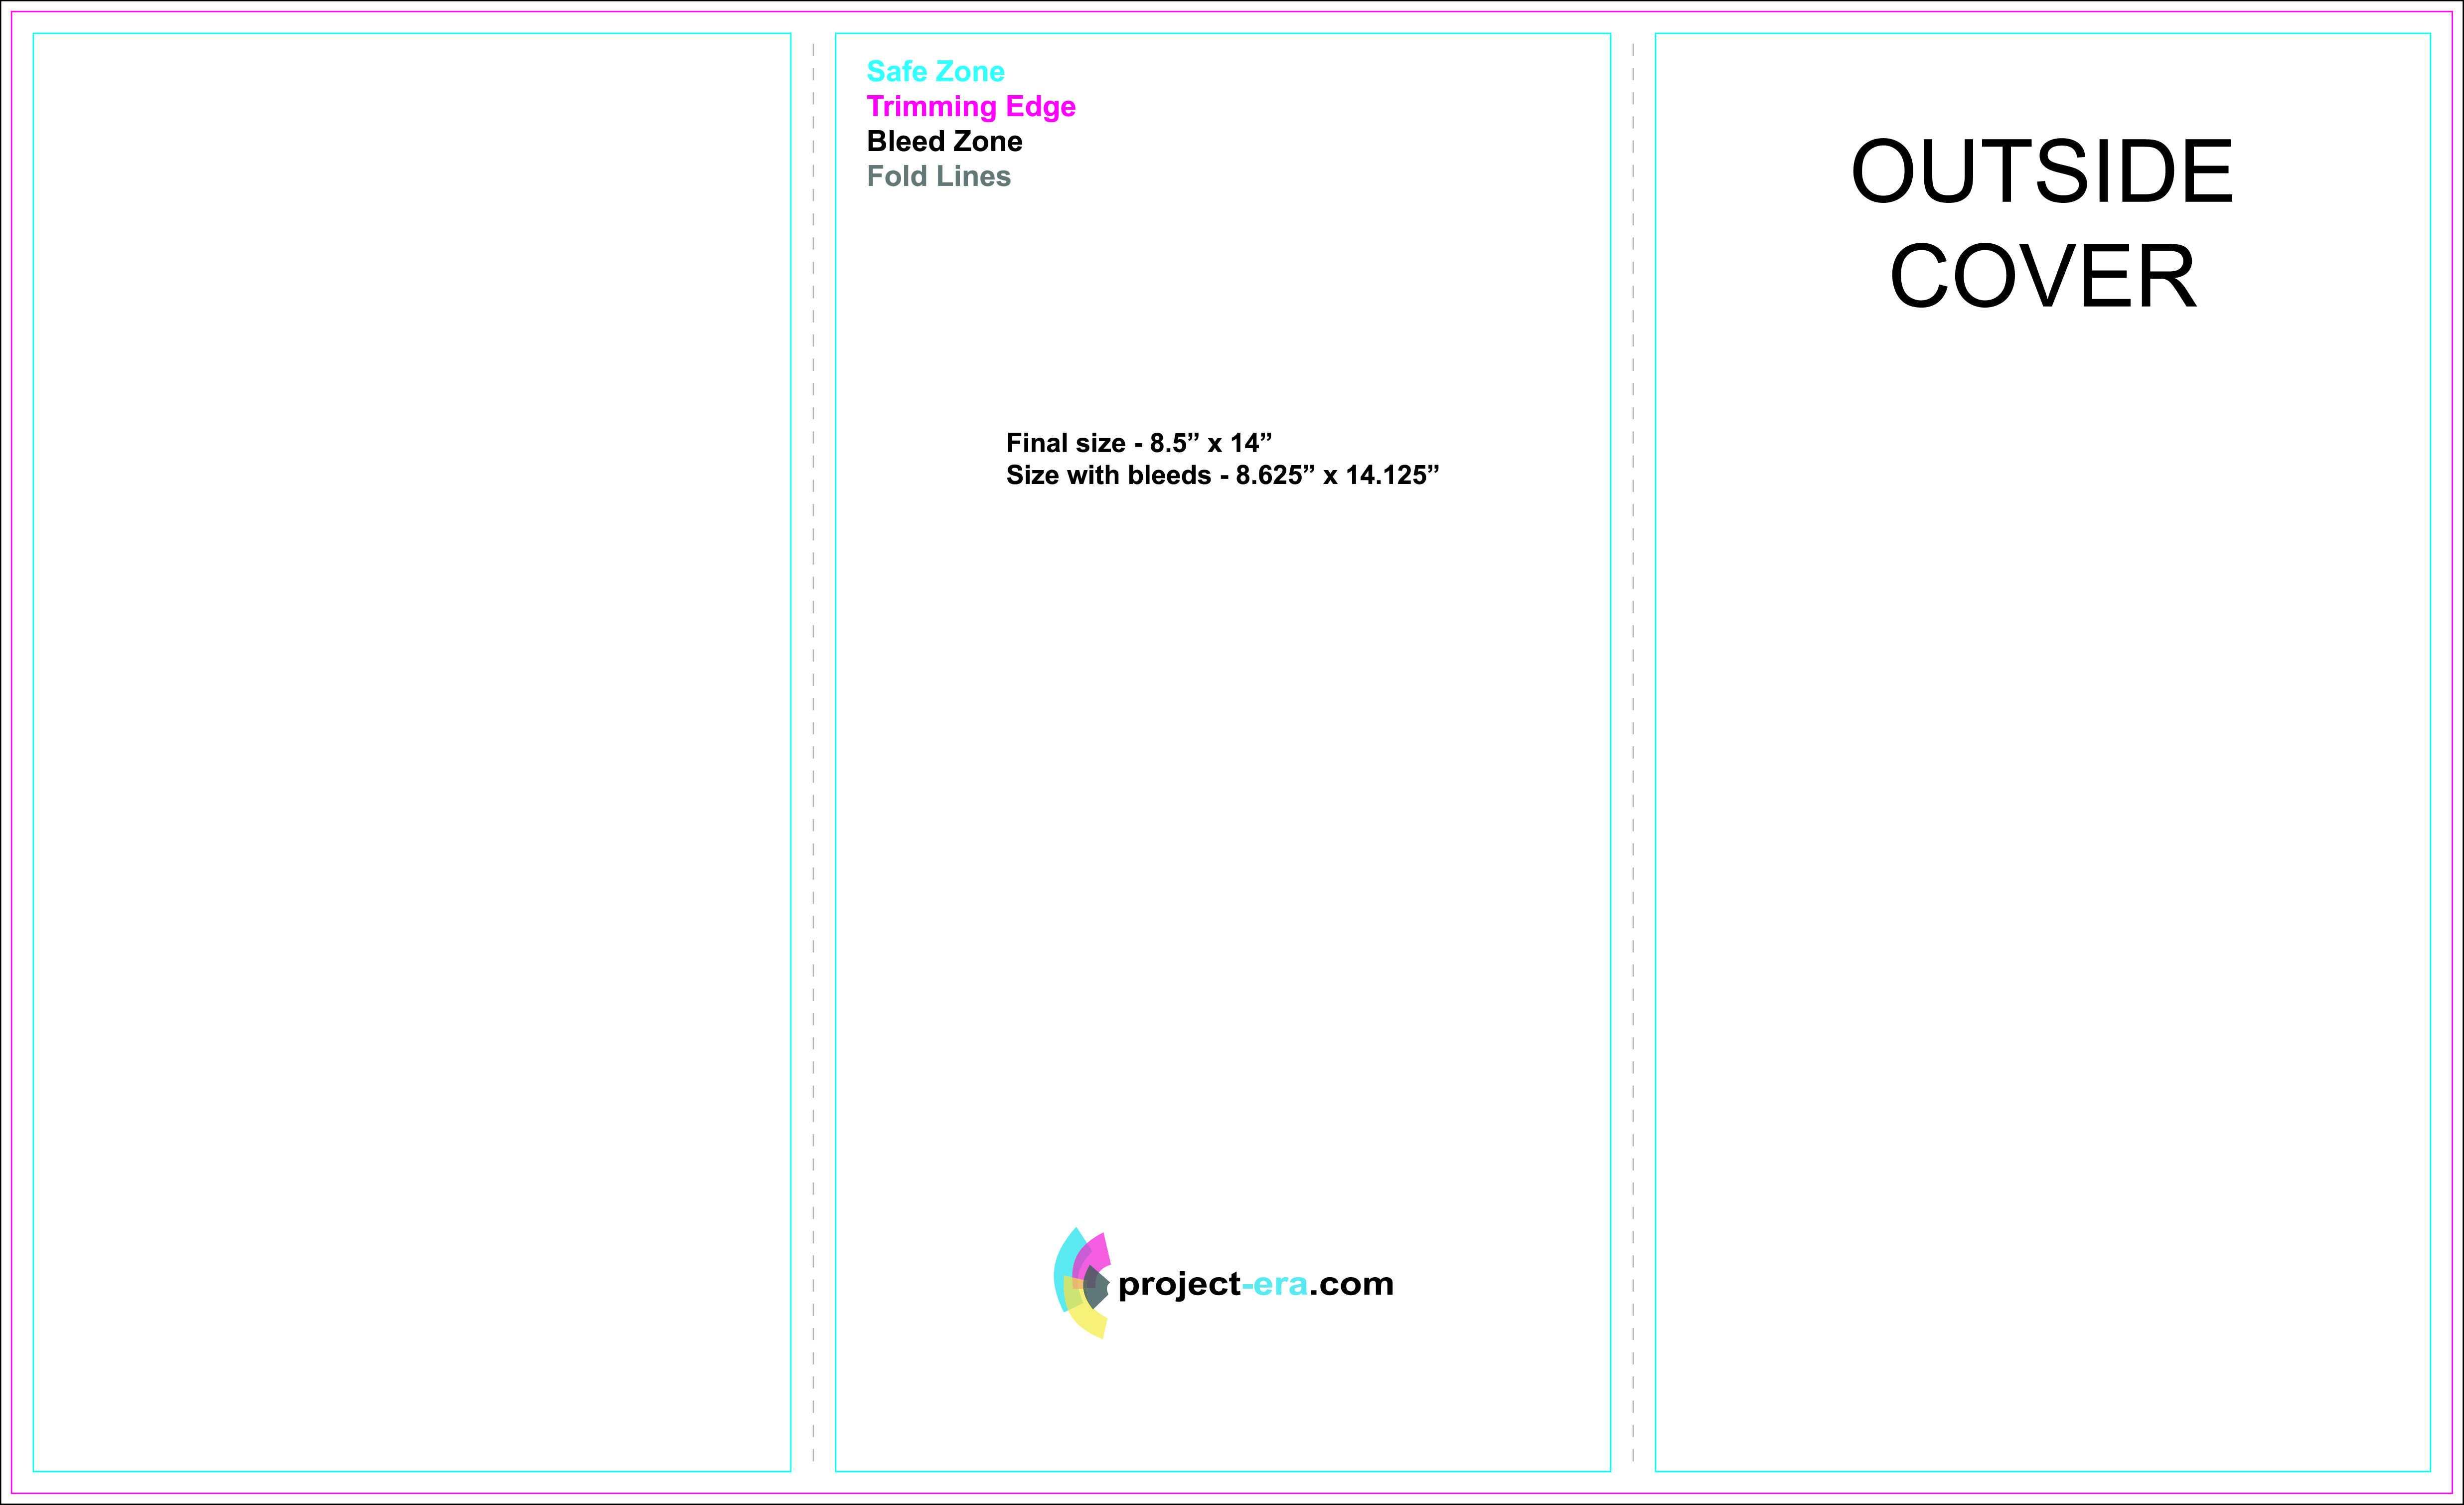 Tri Fold Brochure Template Illustrator (2) | Best Agenda With Tri Fold Brochure Template Illustrator